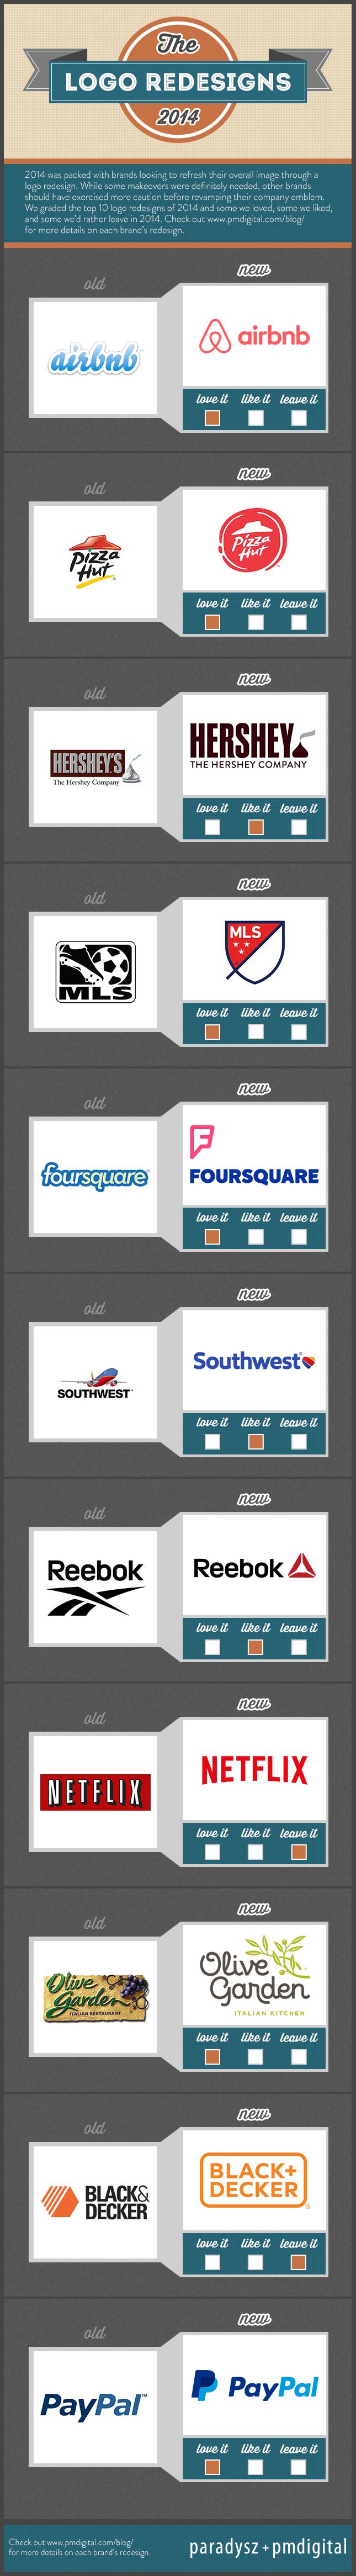 2014-logo-redesign-infographic